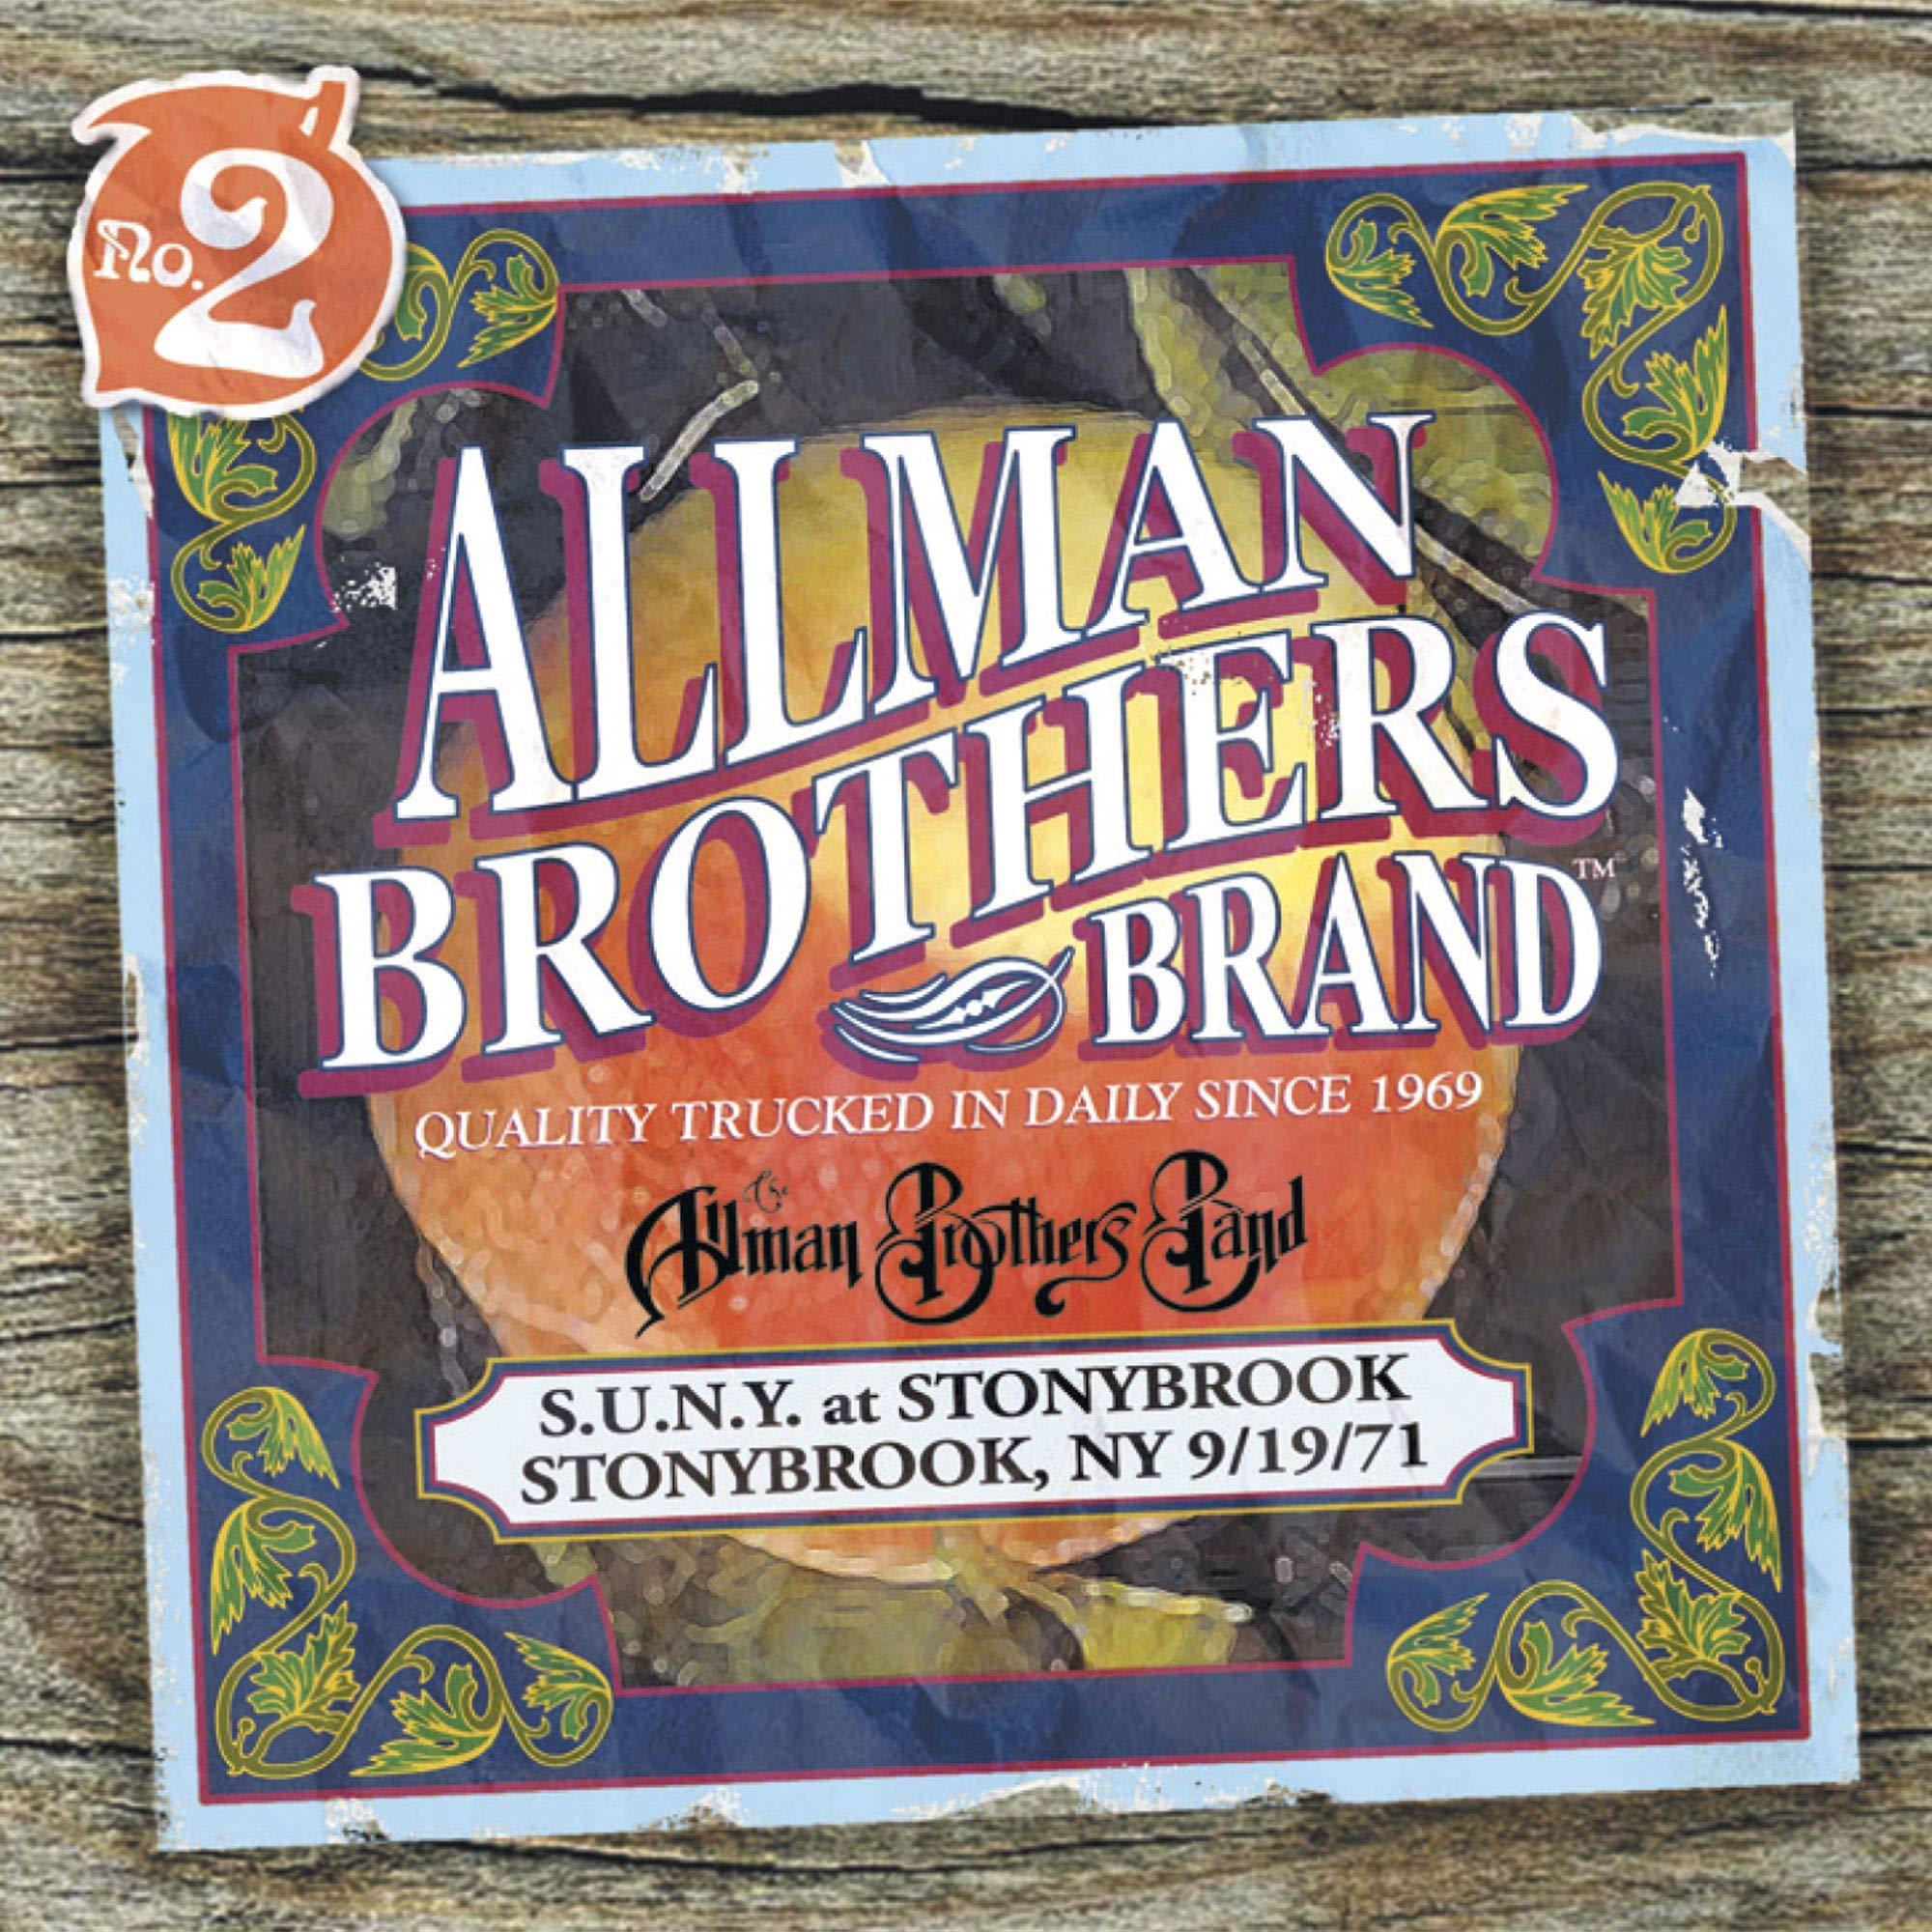 SUNY at Stonybrook by Allman Brothers Band